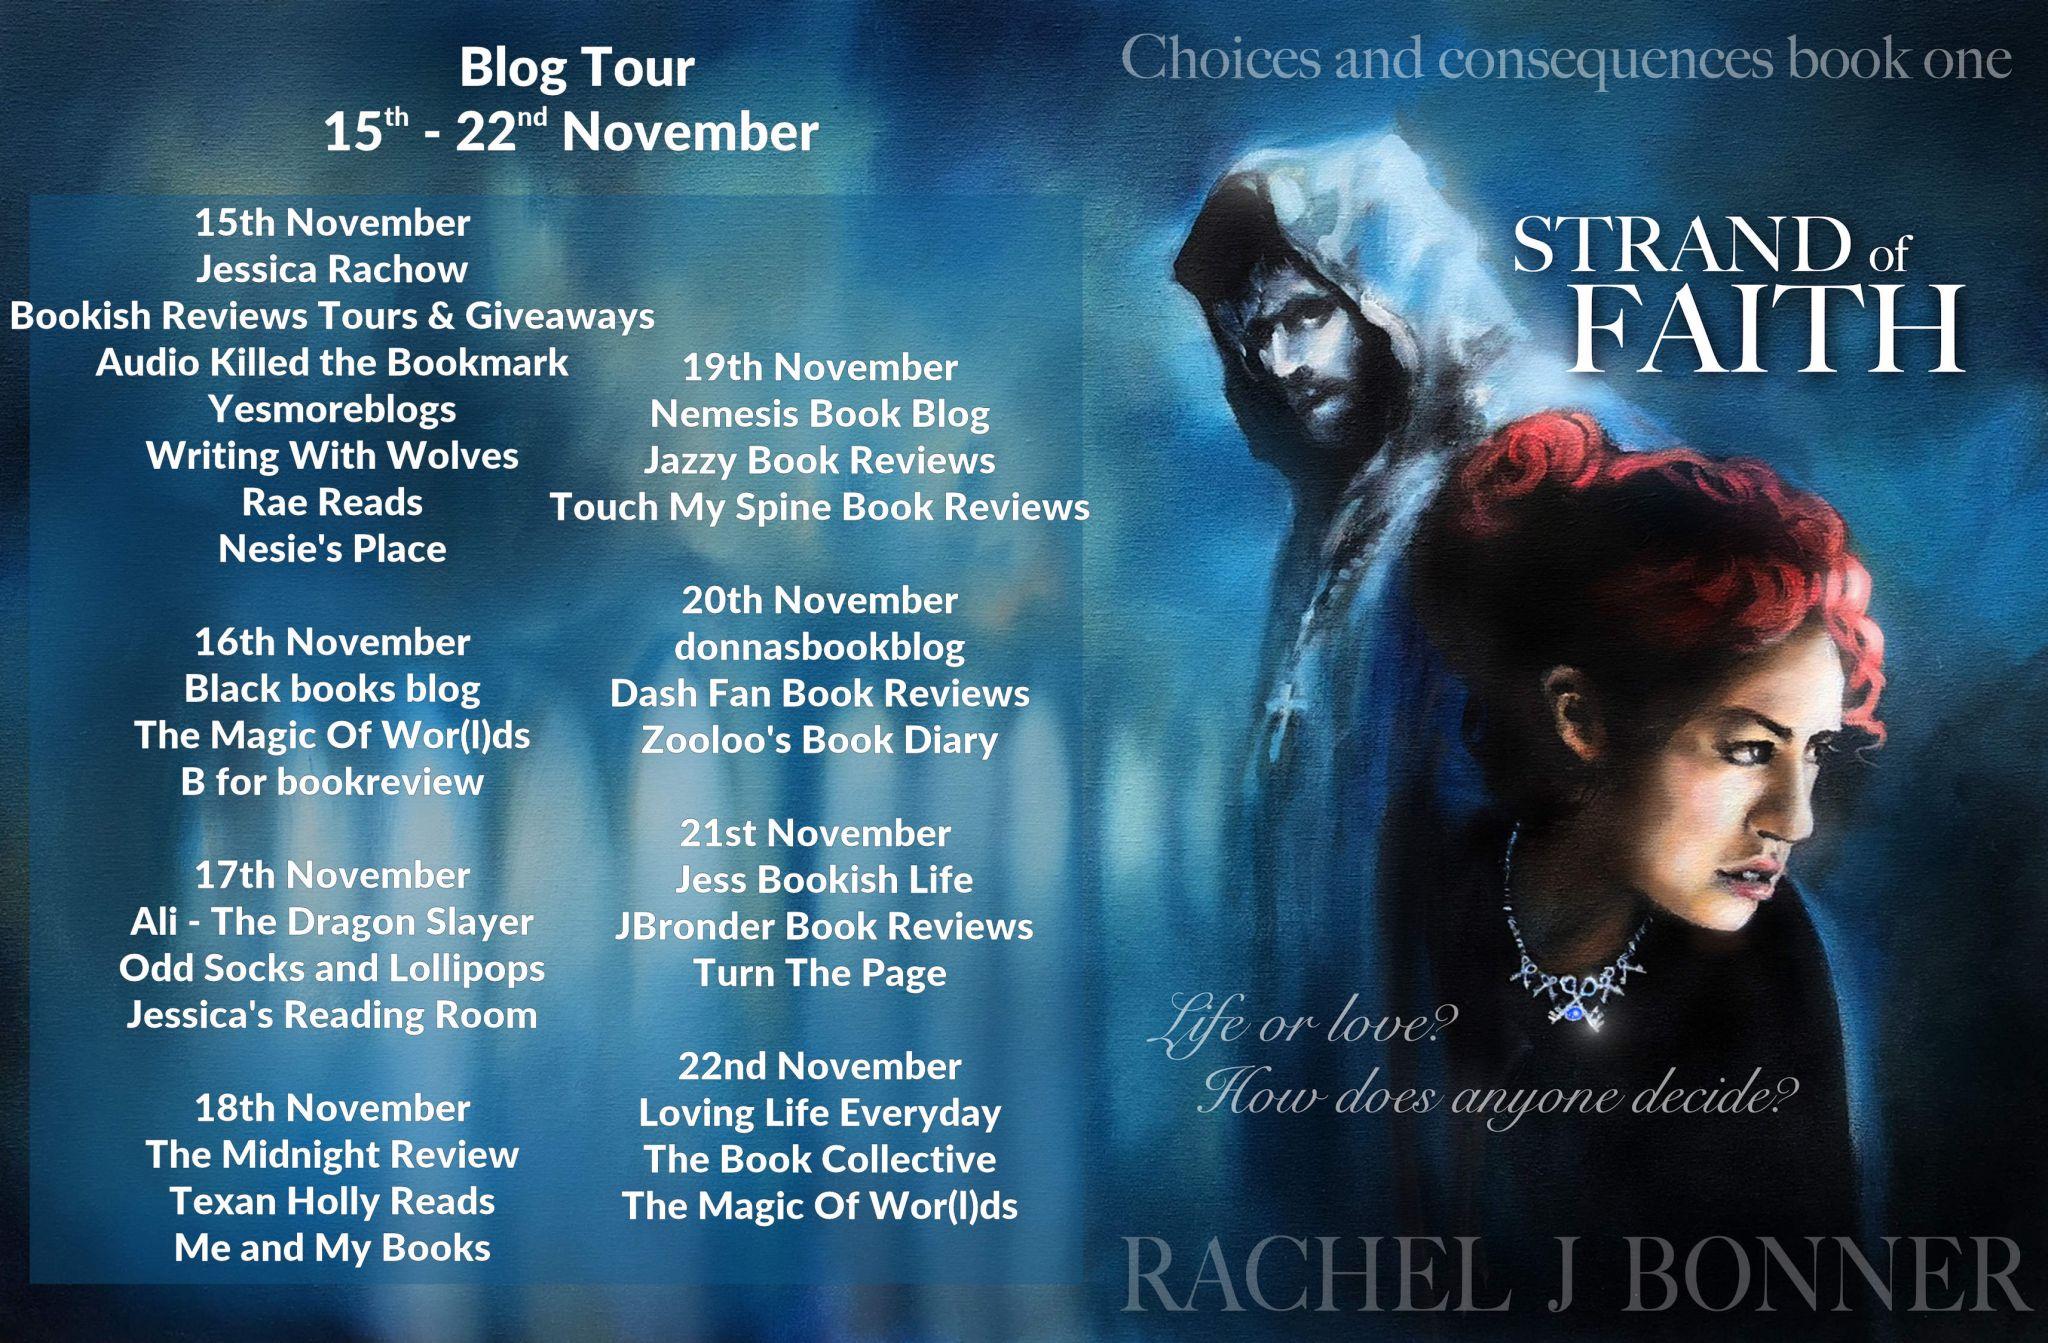 #BookReview of Strand of Faith by Rachel J. Bonner @RachelJBonner1 @rararesources #giveaway